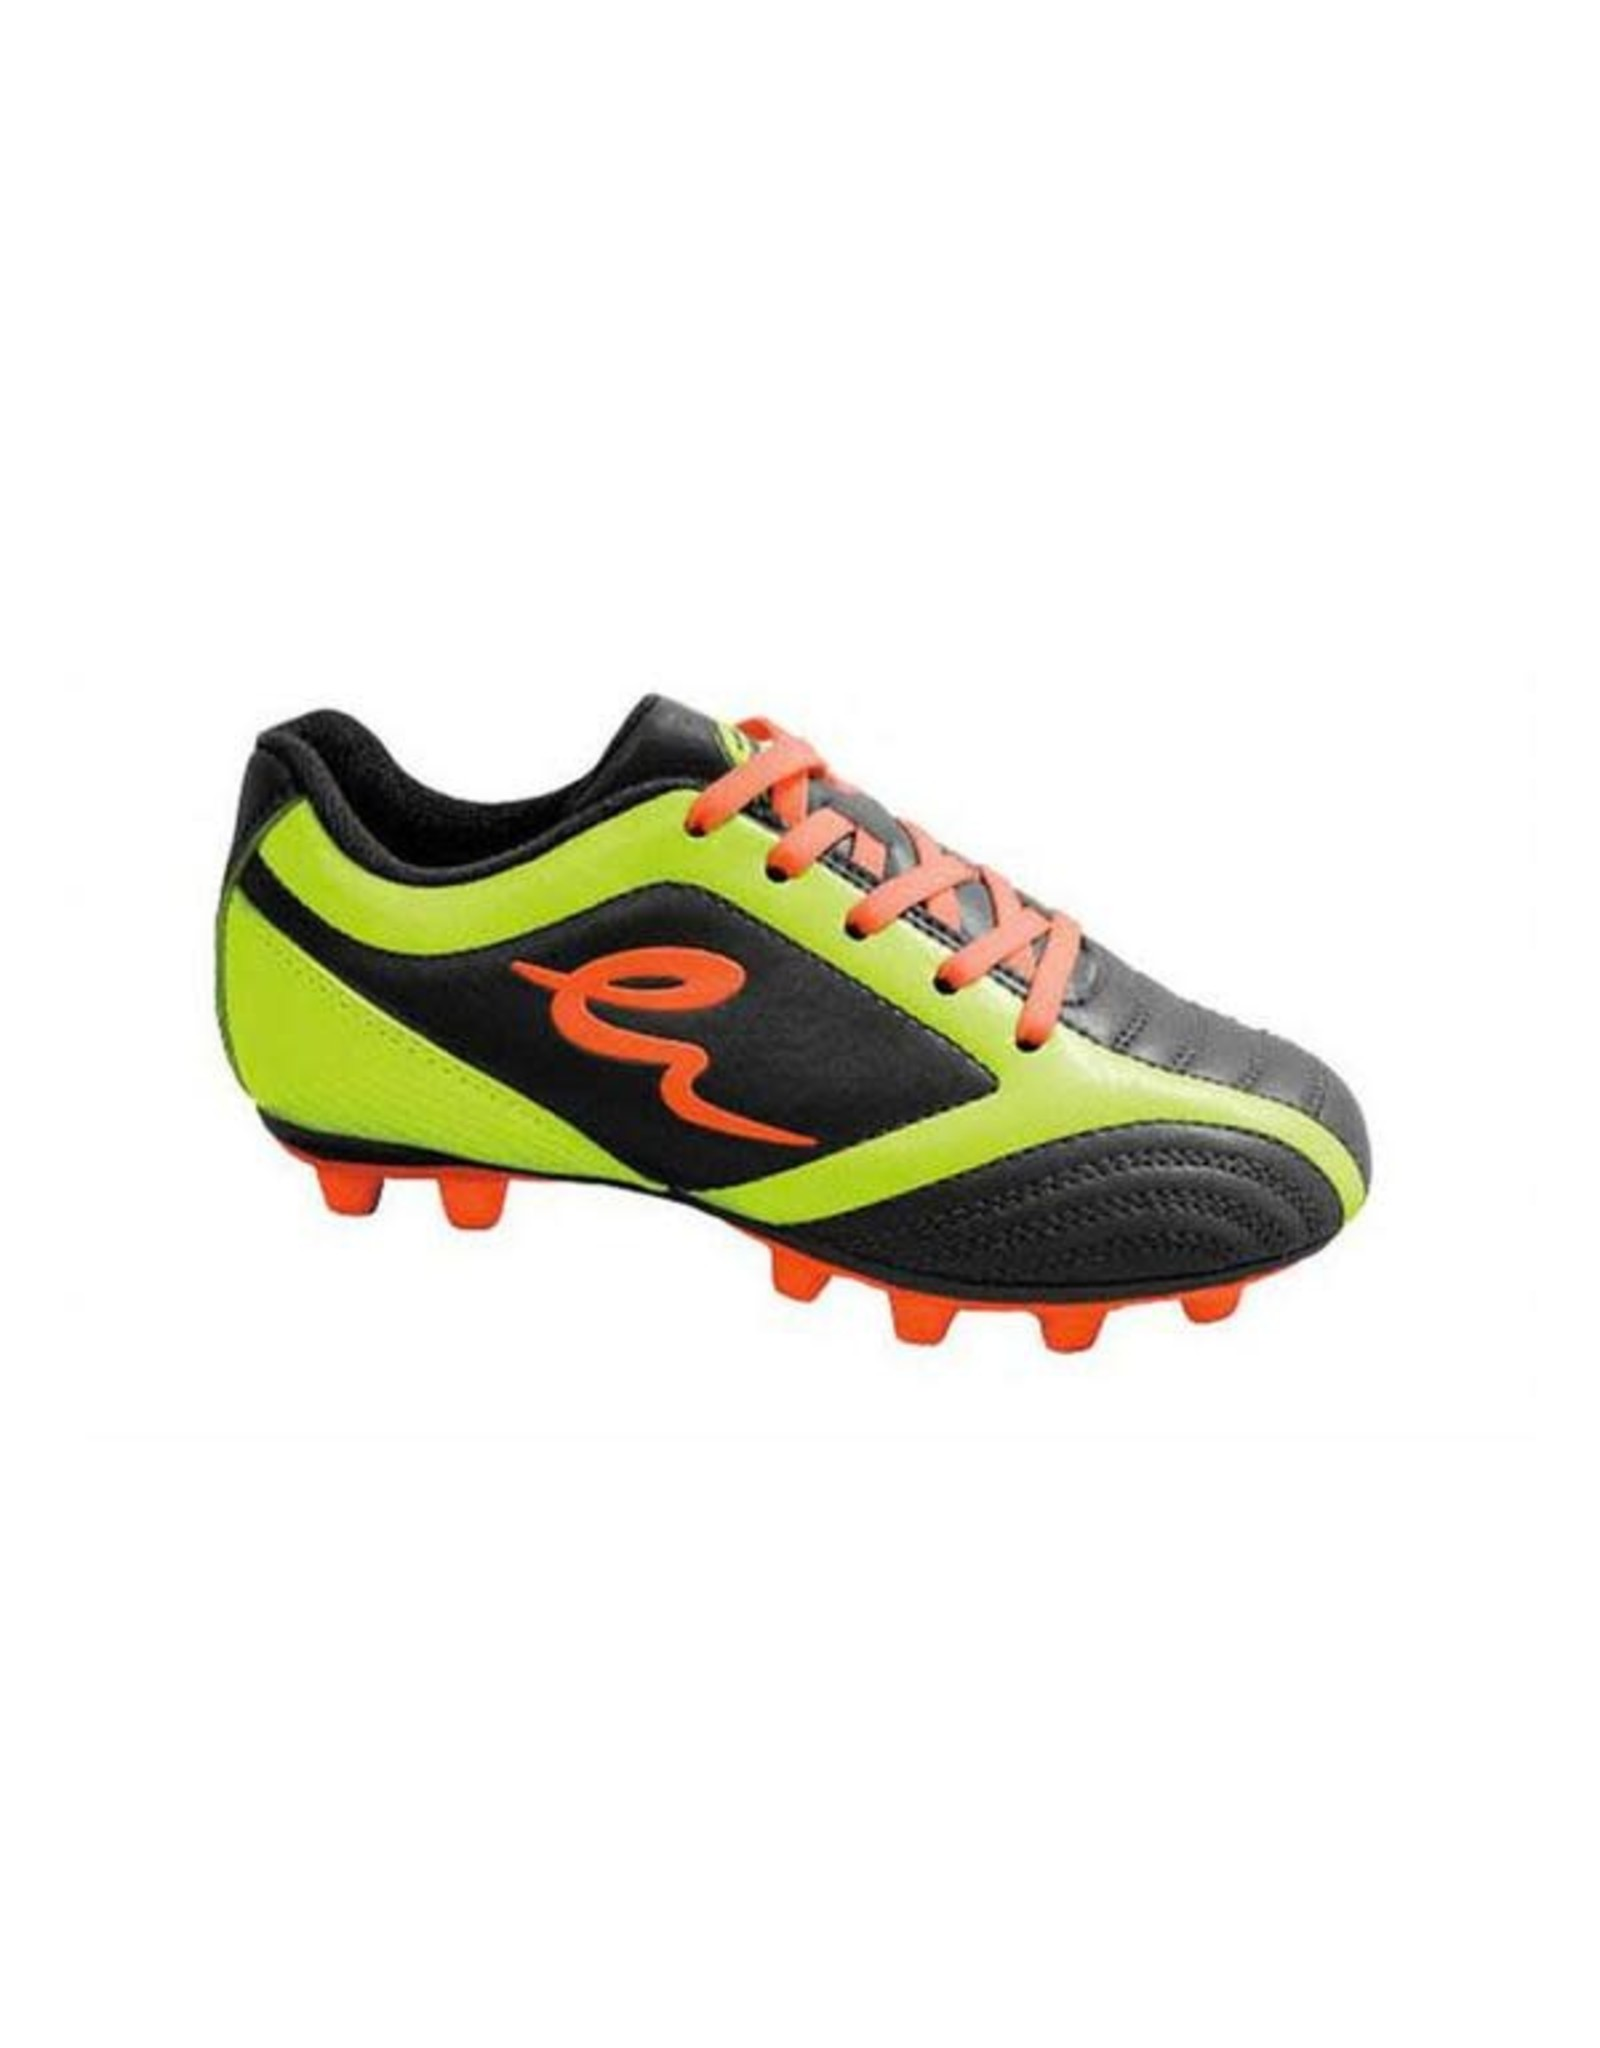 Eletto Eletto Outdoor Shoes Mondo II RB Junior Cleats (Black/Fluo Yellow)